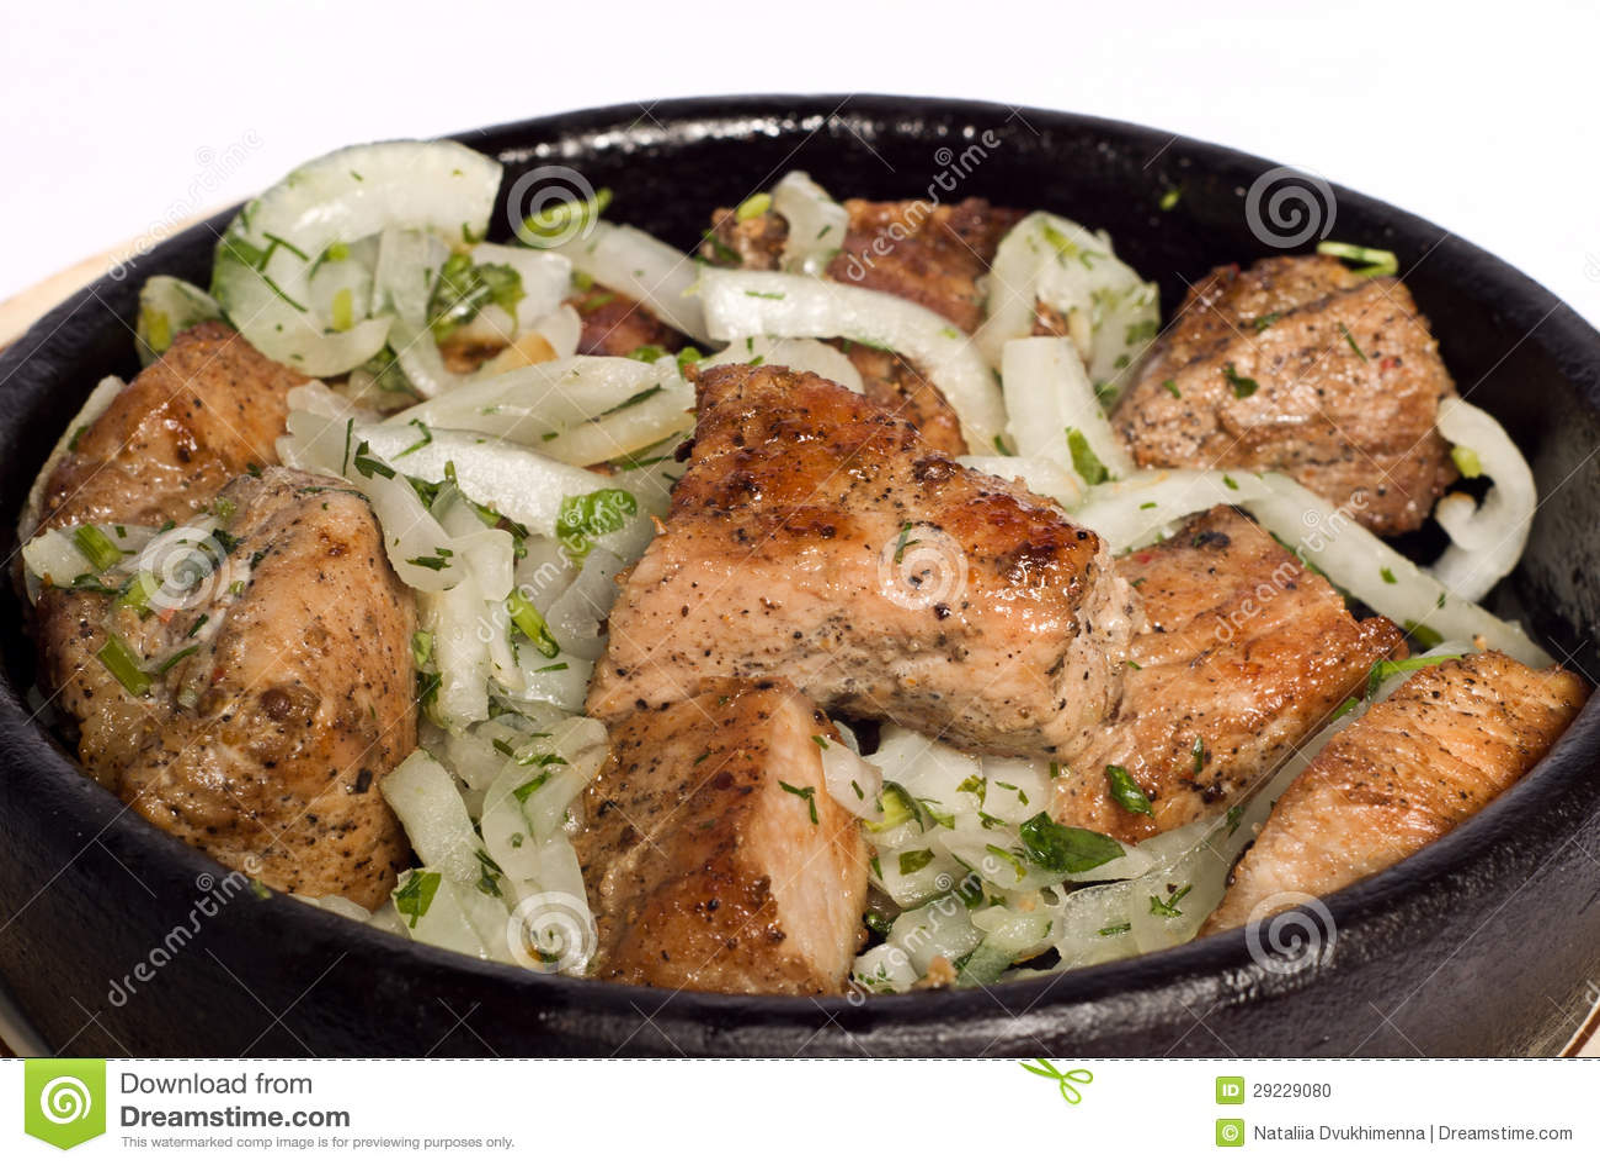 Download Carne com cebola foto de stock. Imagem de verde, roasted - 29229080